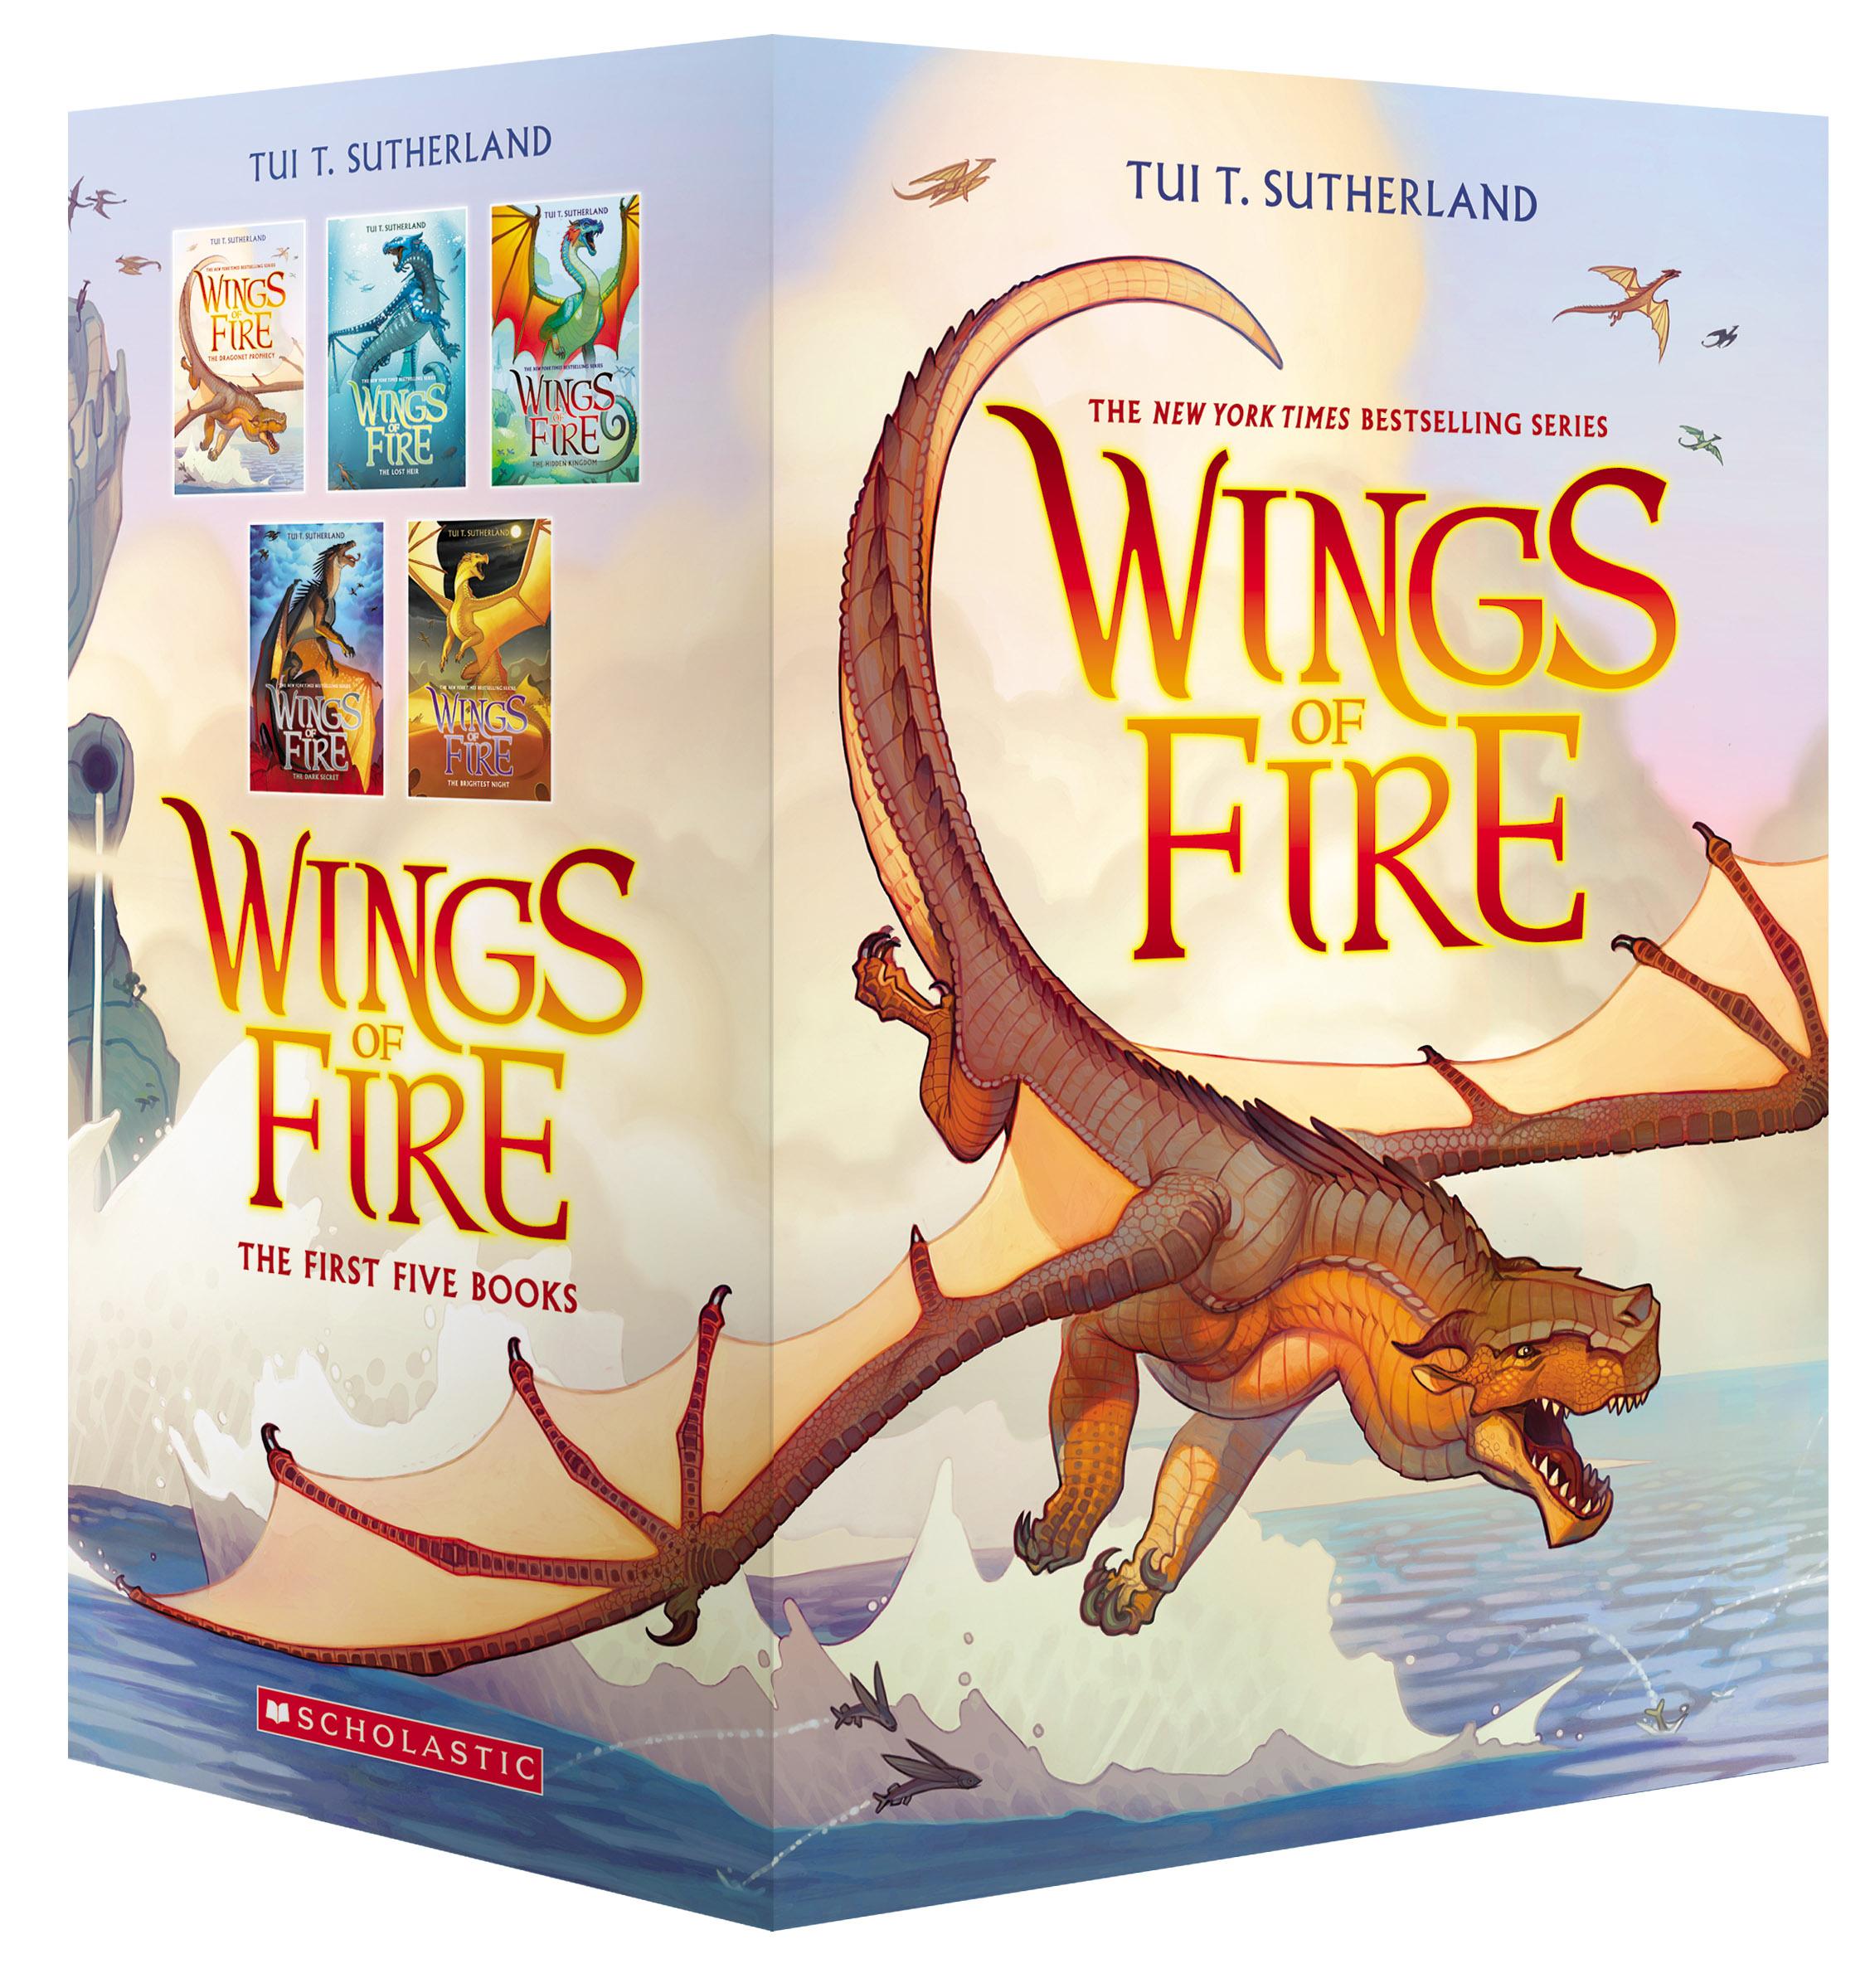 Wings Of Fire Boxset (Books 1 - 5)